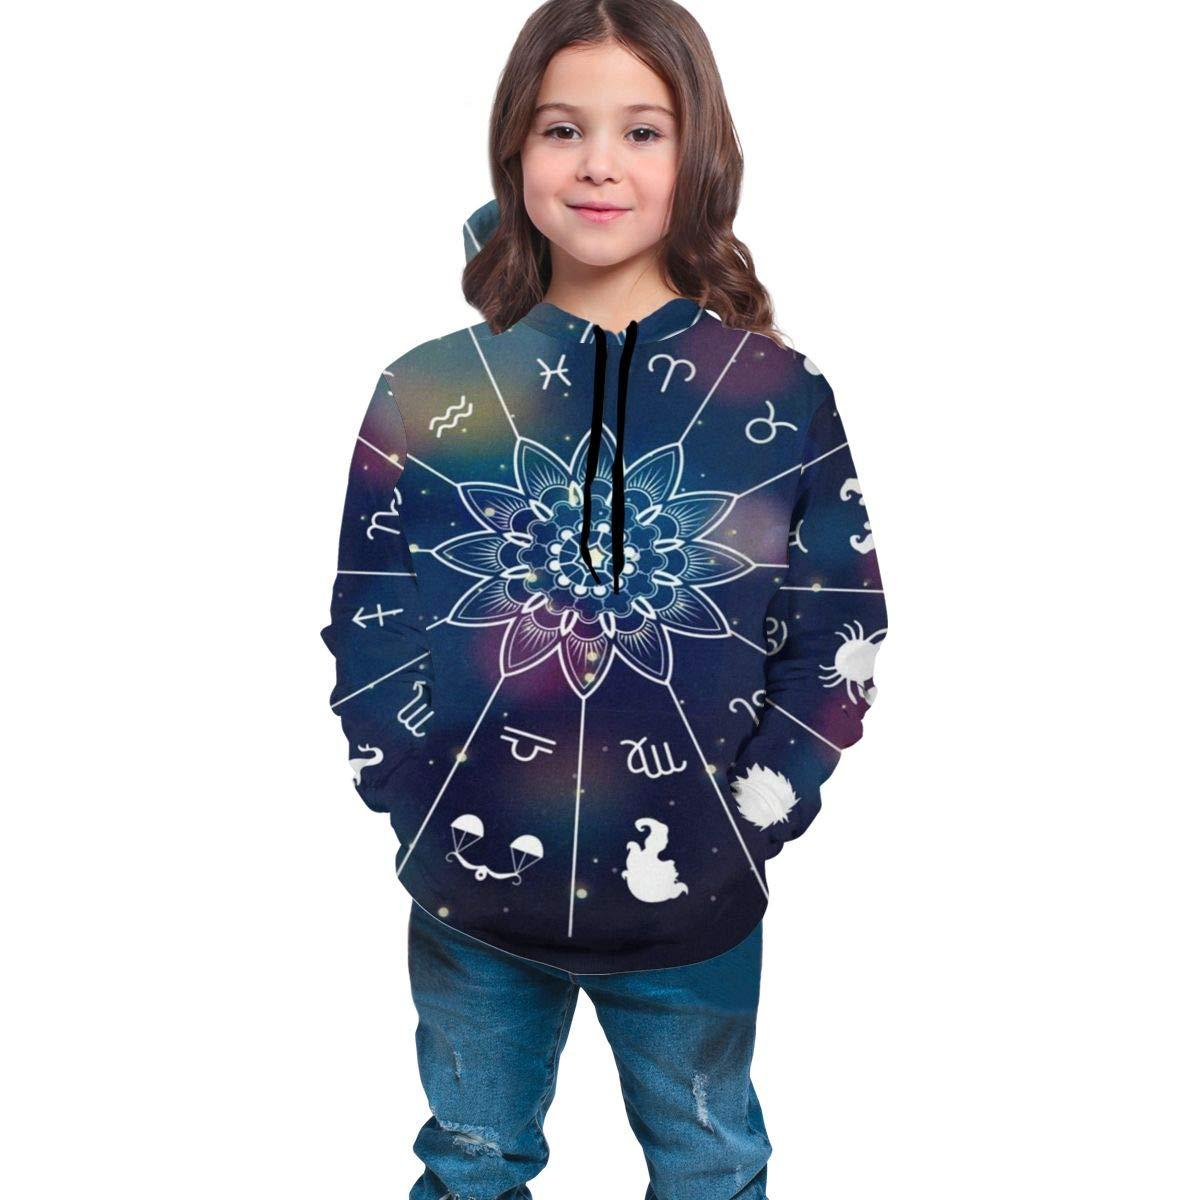 Pullover Hoodie Zodiac Polka Dot Sweatshirt Apparel Soft with Big Pockets for Boys Girls